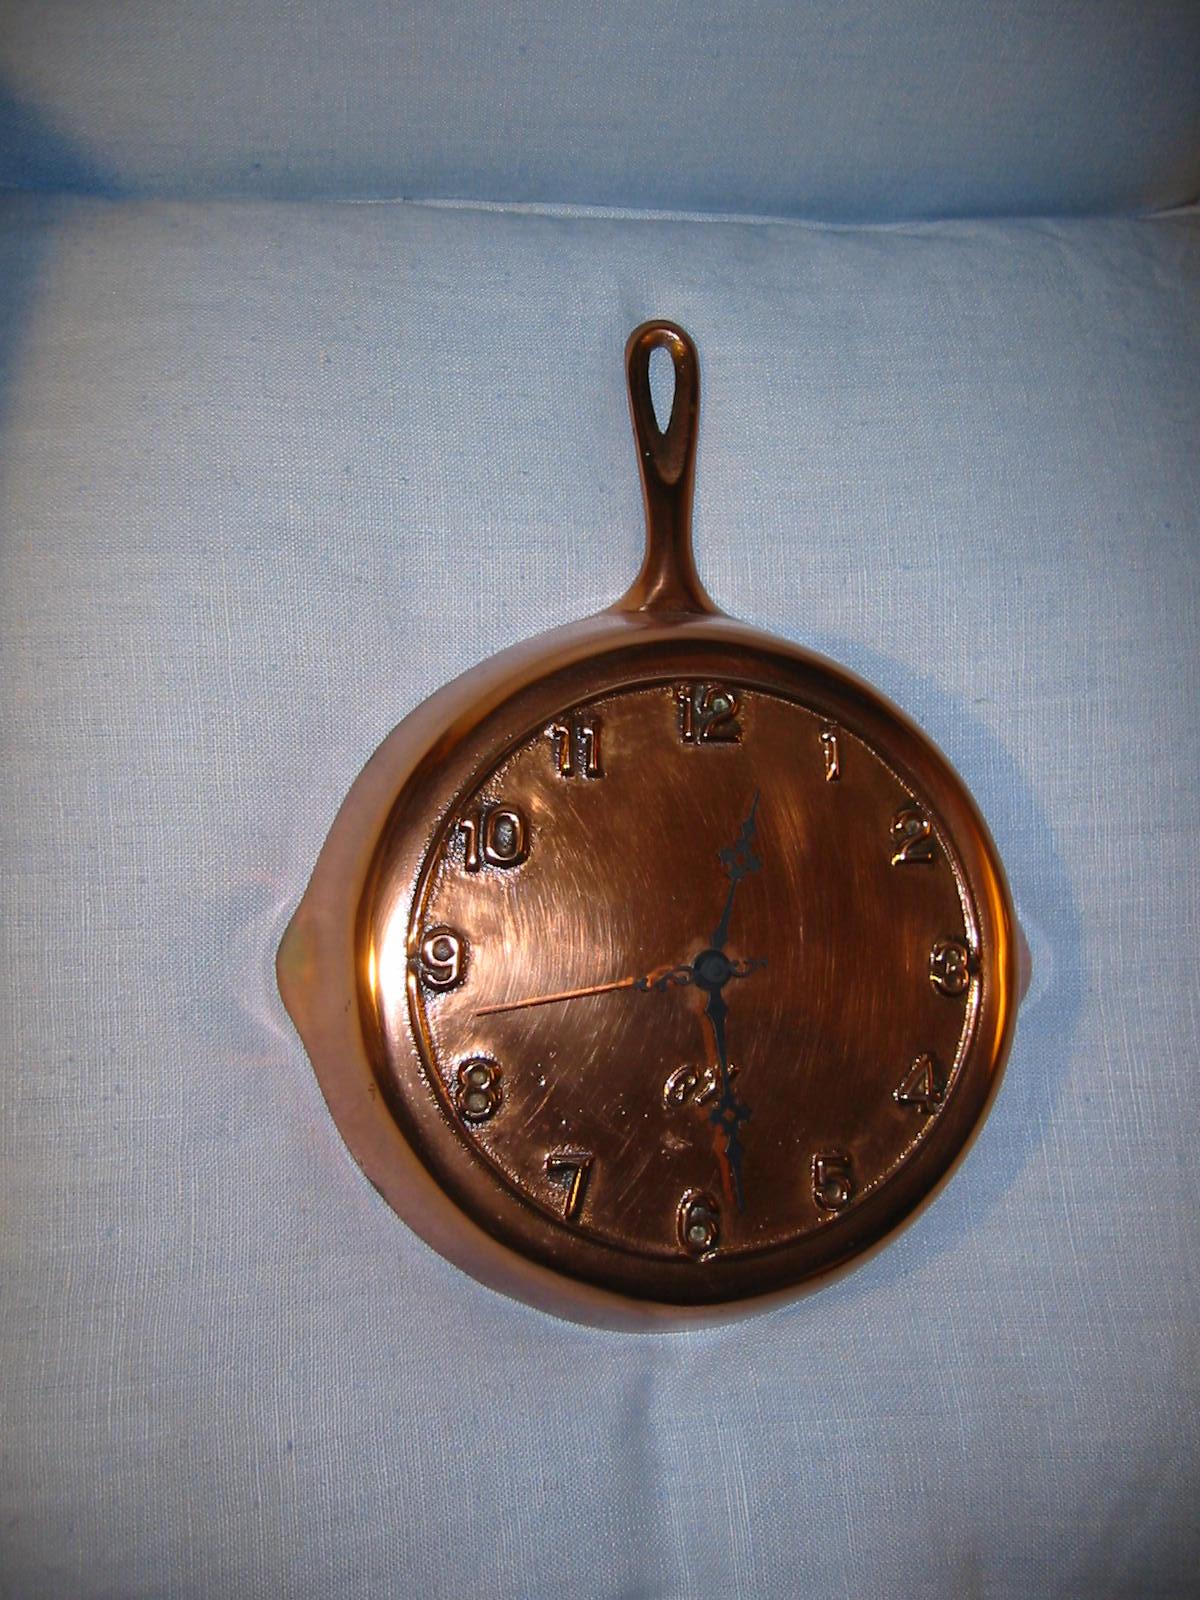 kitchen clocks for sale appliances package copper pan quartz wall clock marked bx